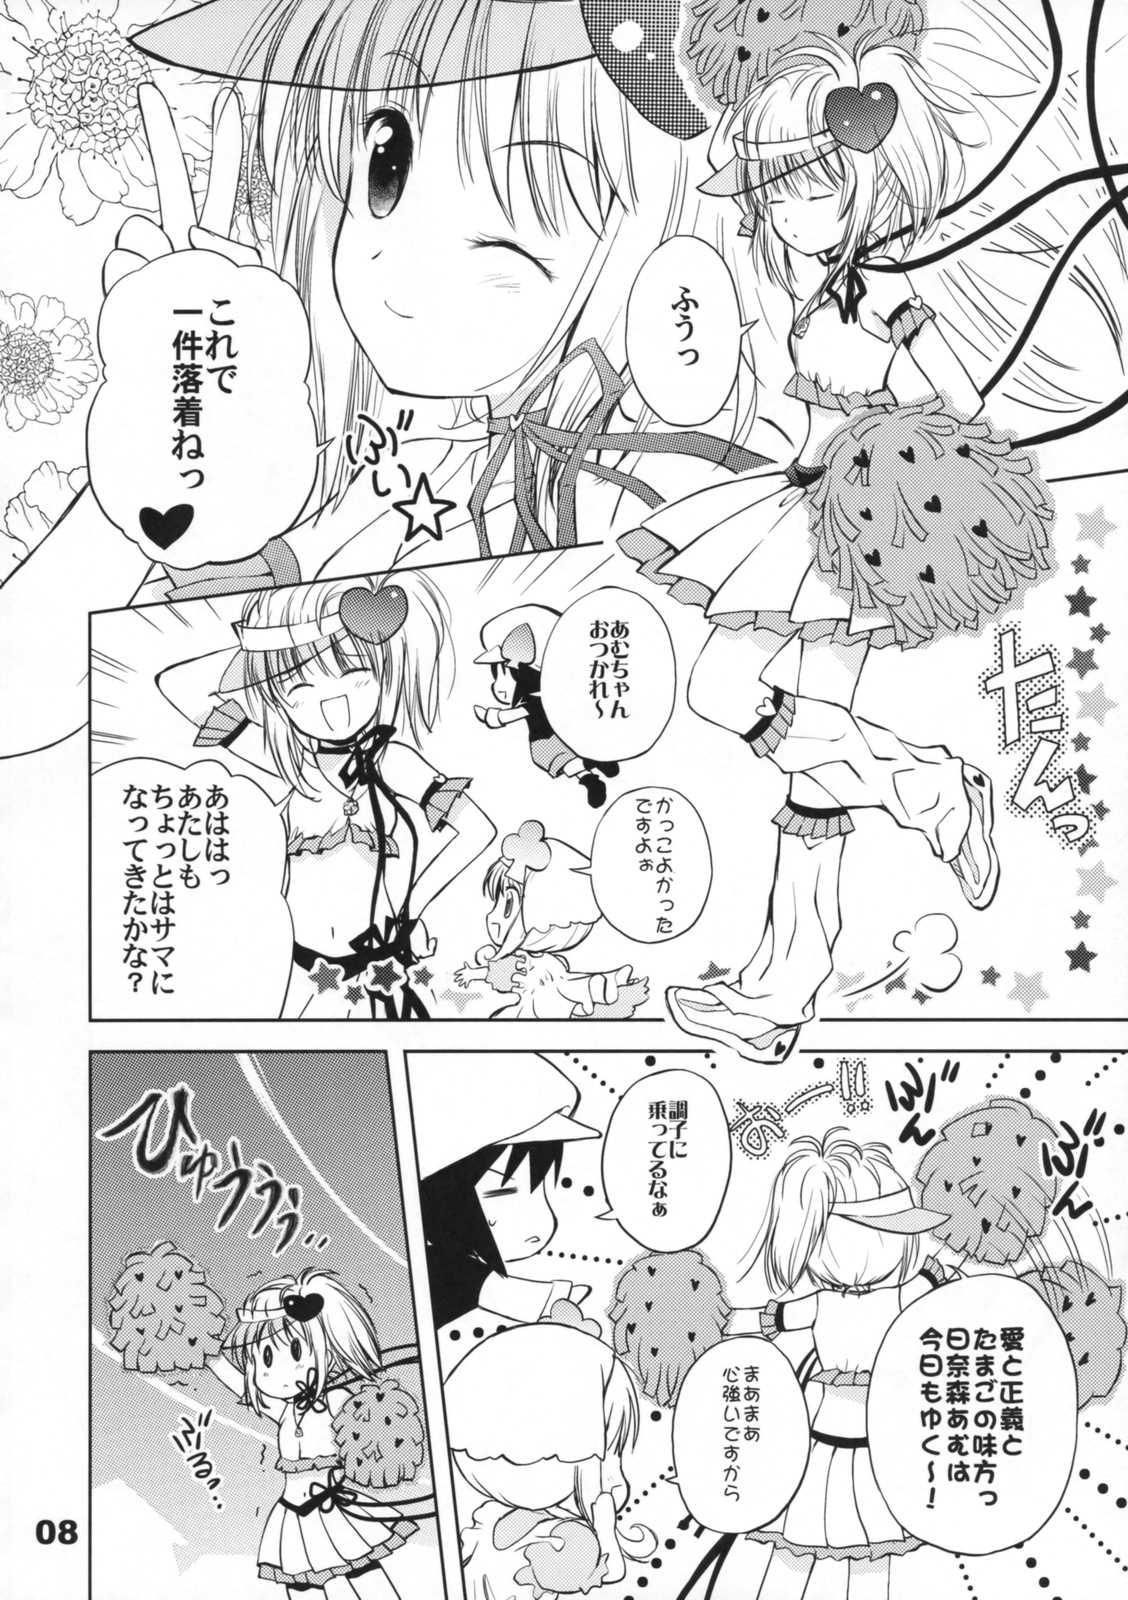 Template talkAnime and manga - Wikipedia